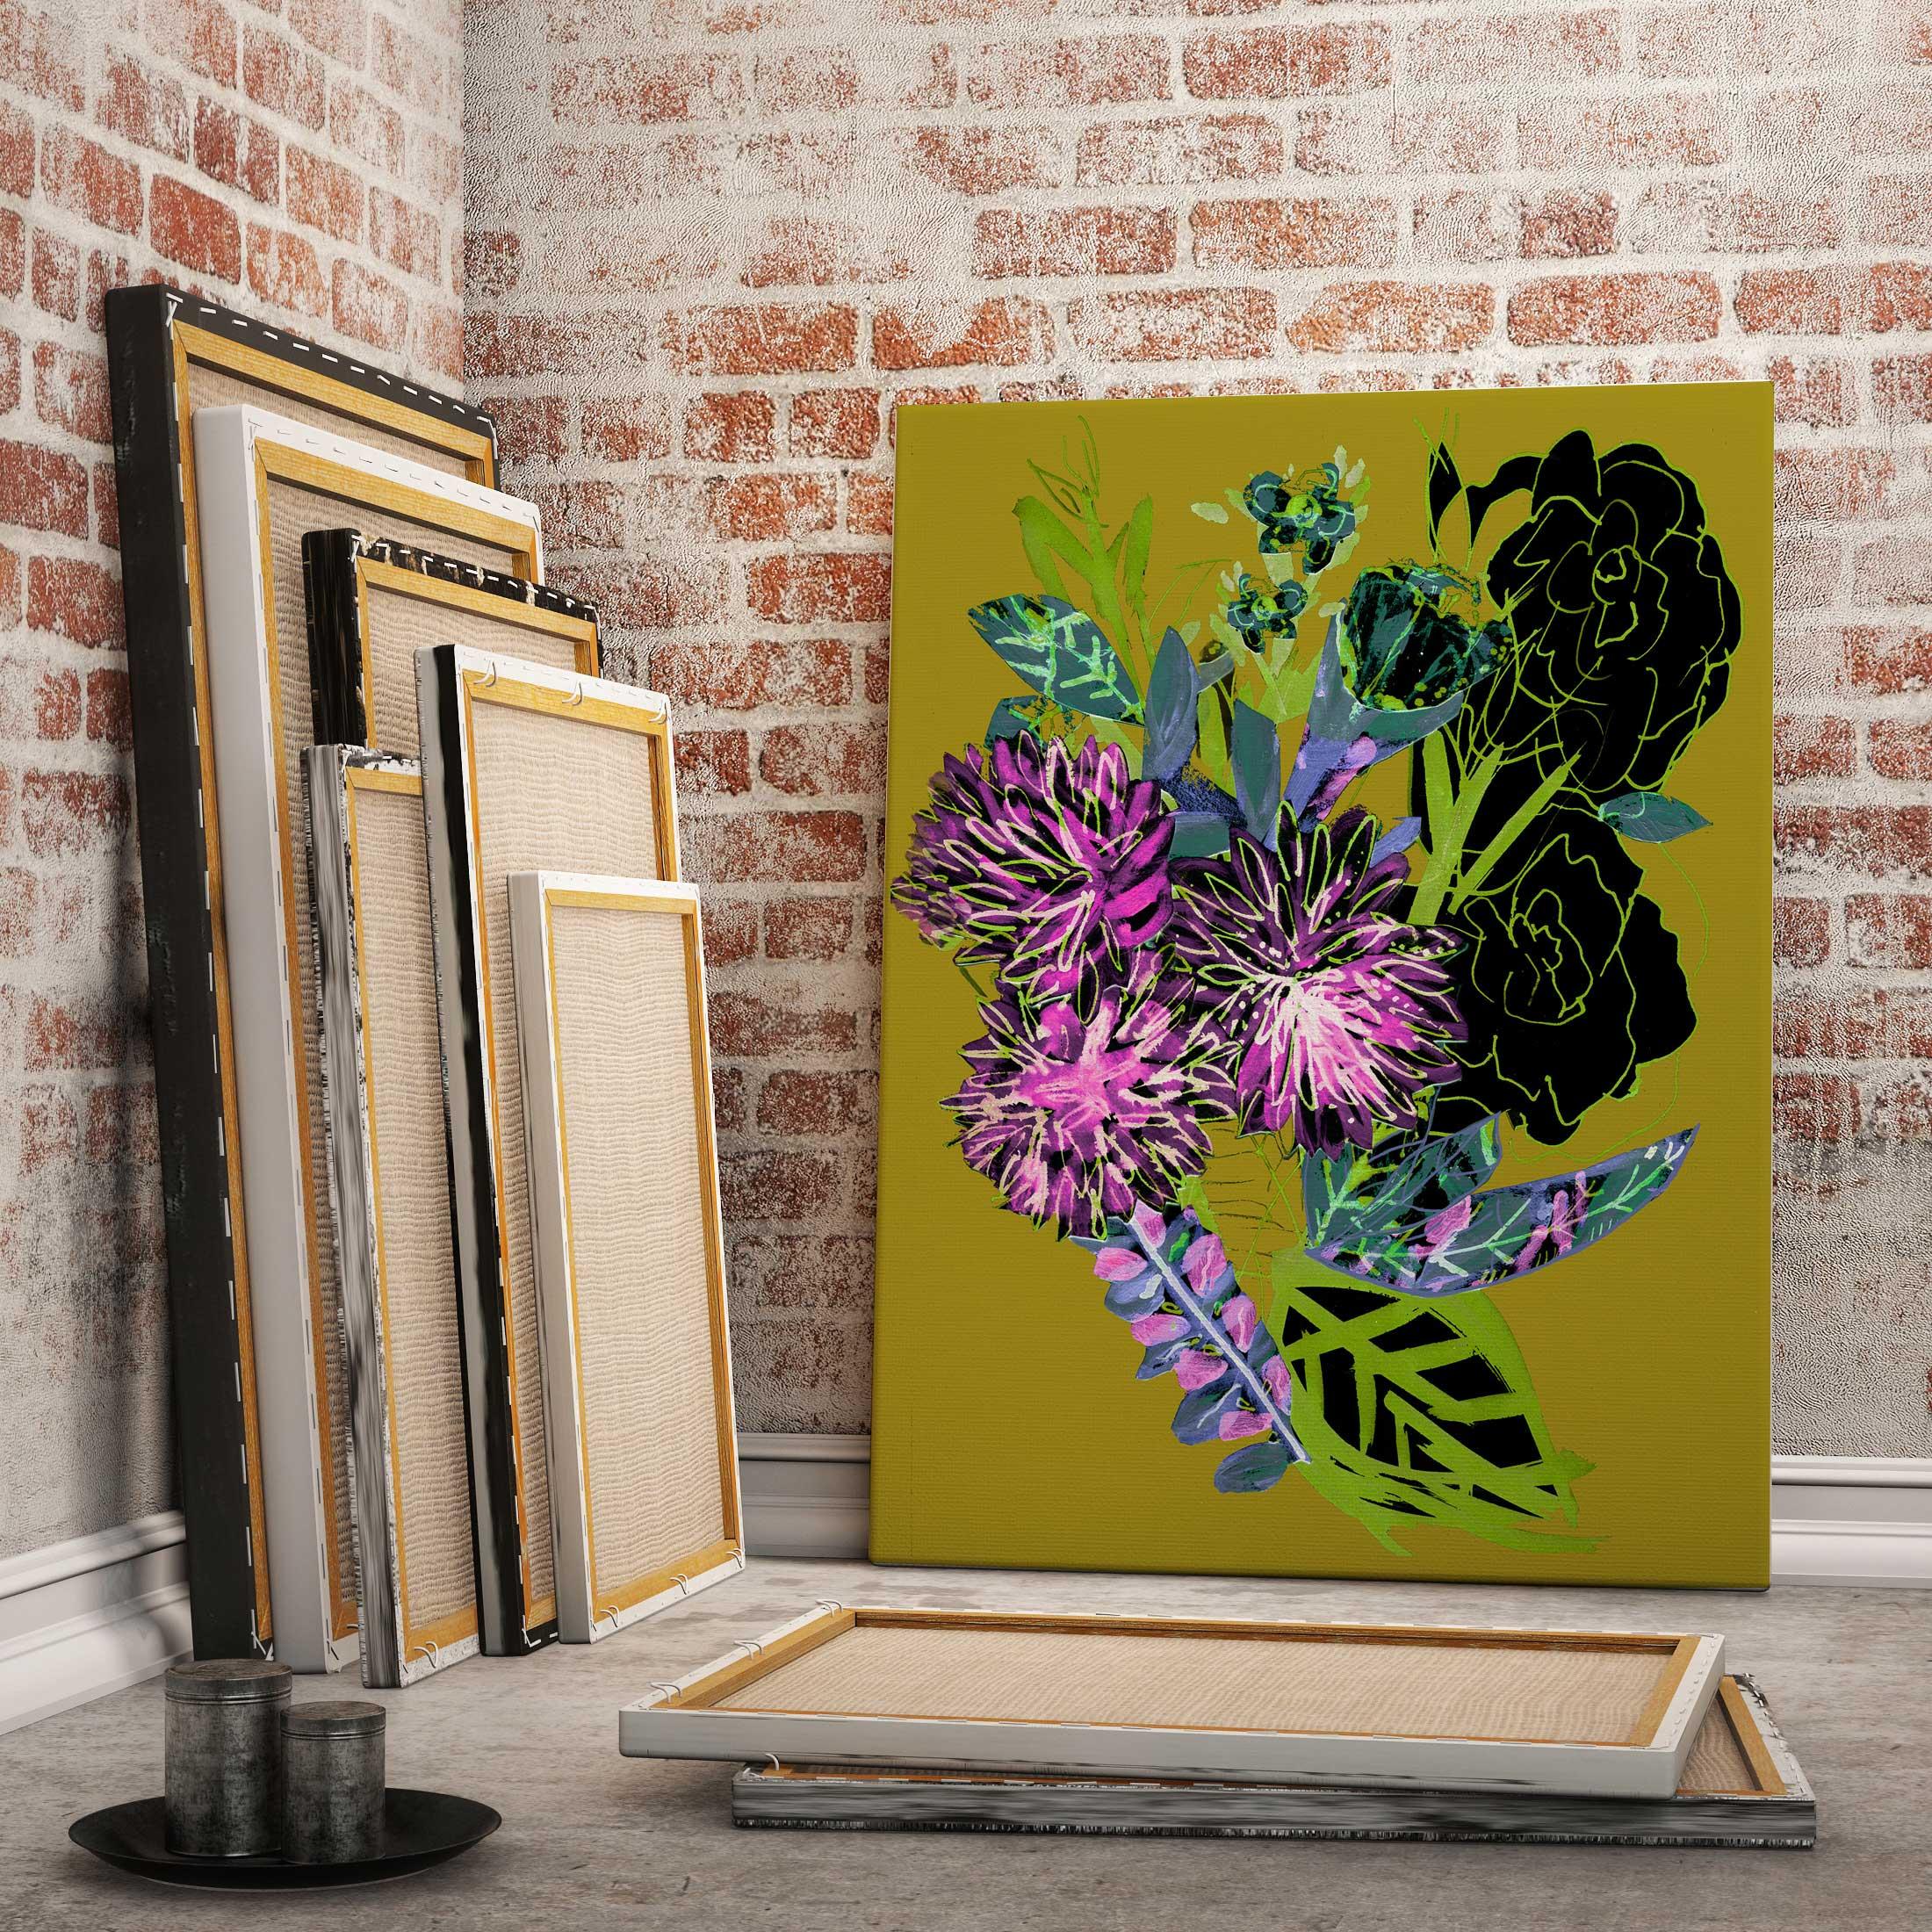 AK_Vintage-Floral-Canvas-01.jpg